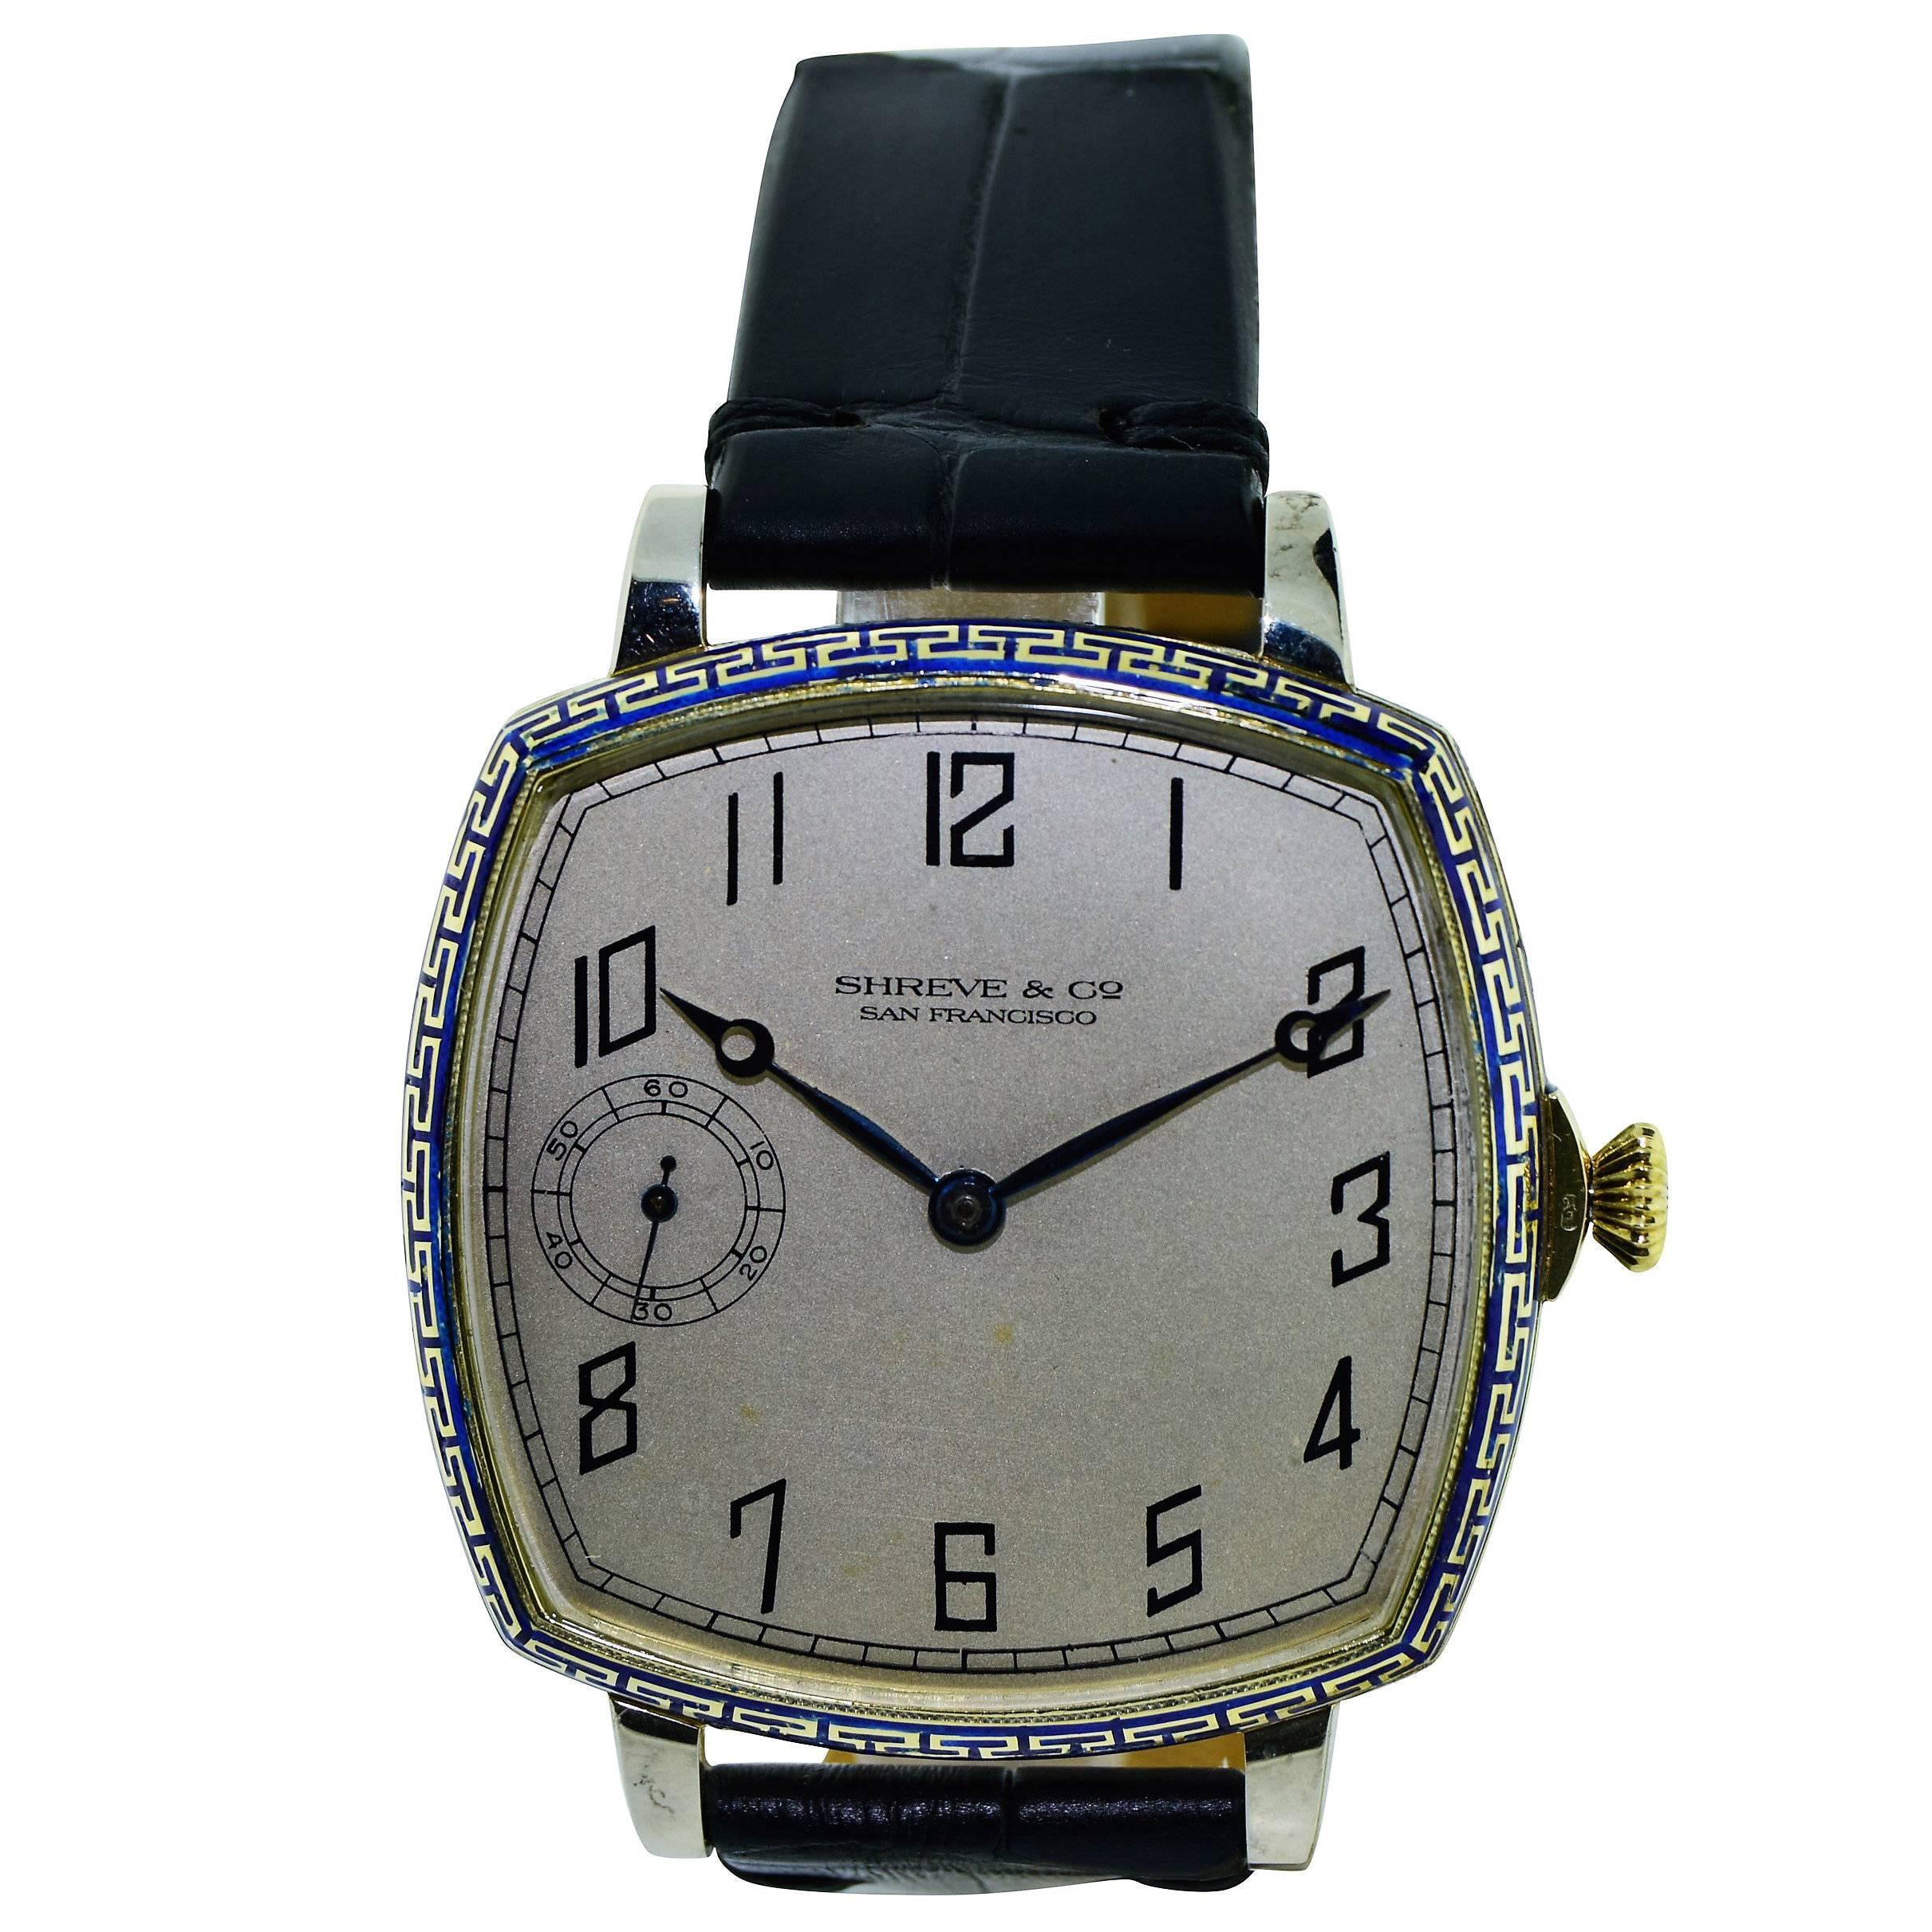 Shreve Yellow and White Gold Enamel Oversized Art Deco Watch